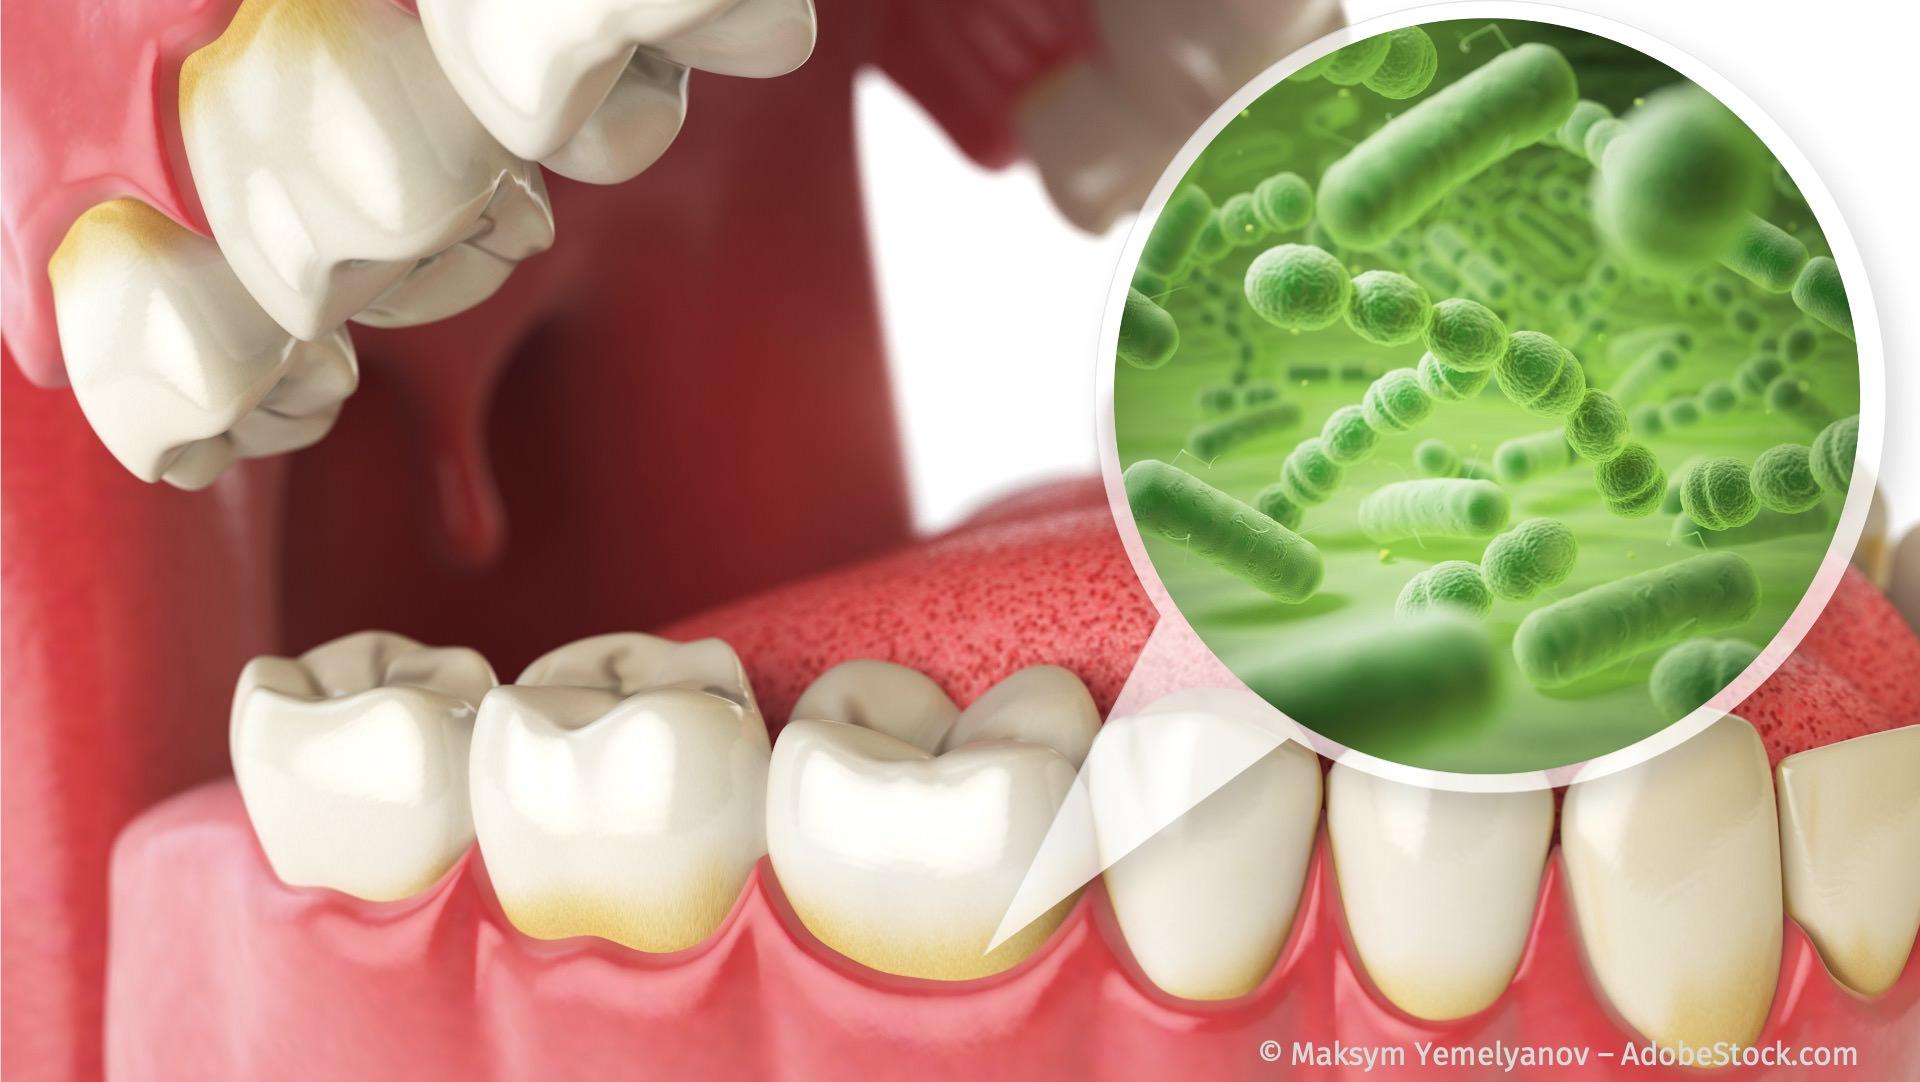 Parodontitis-Ursachen